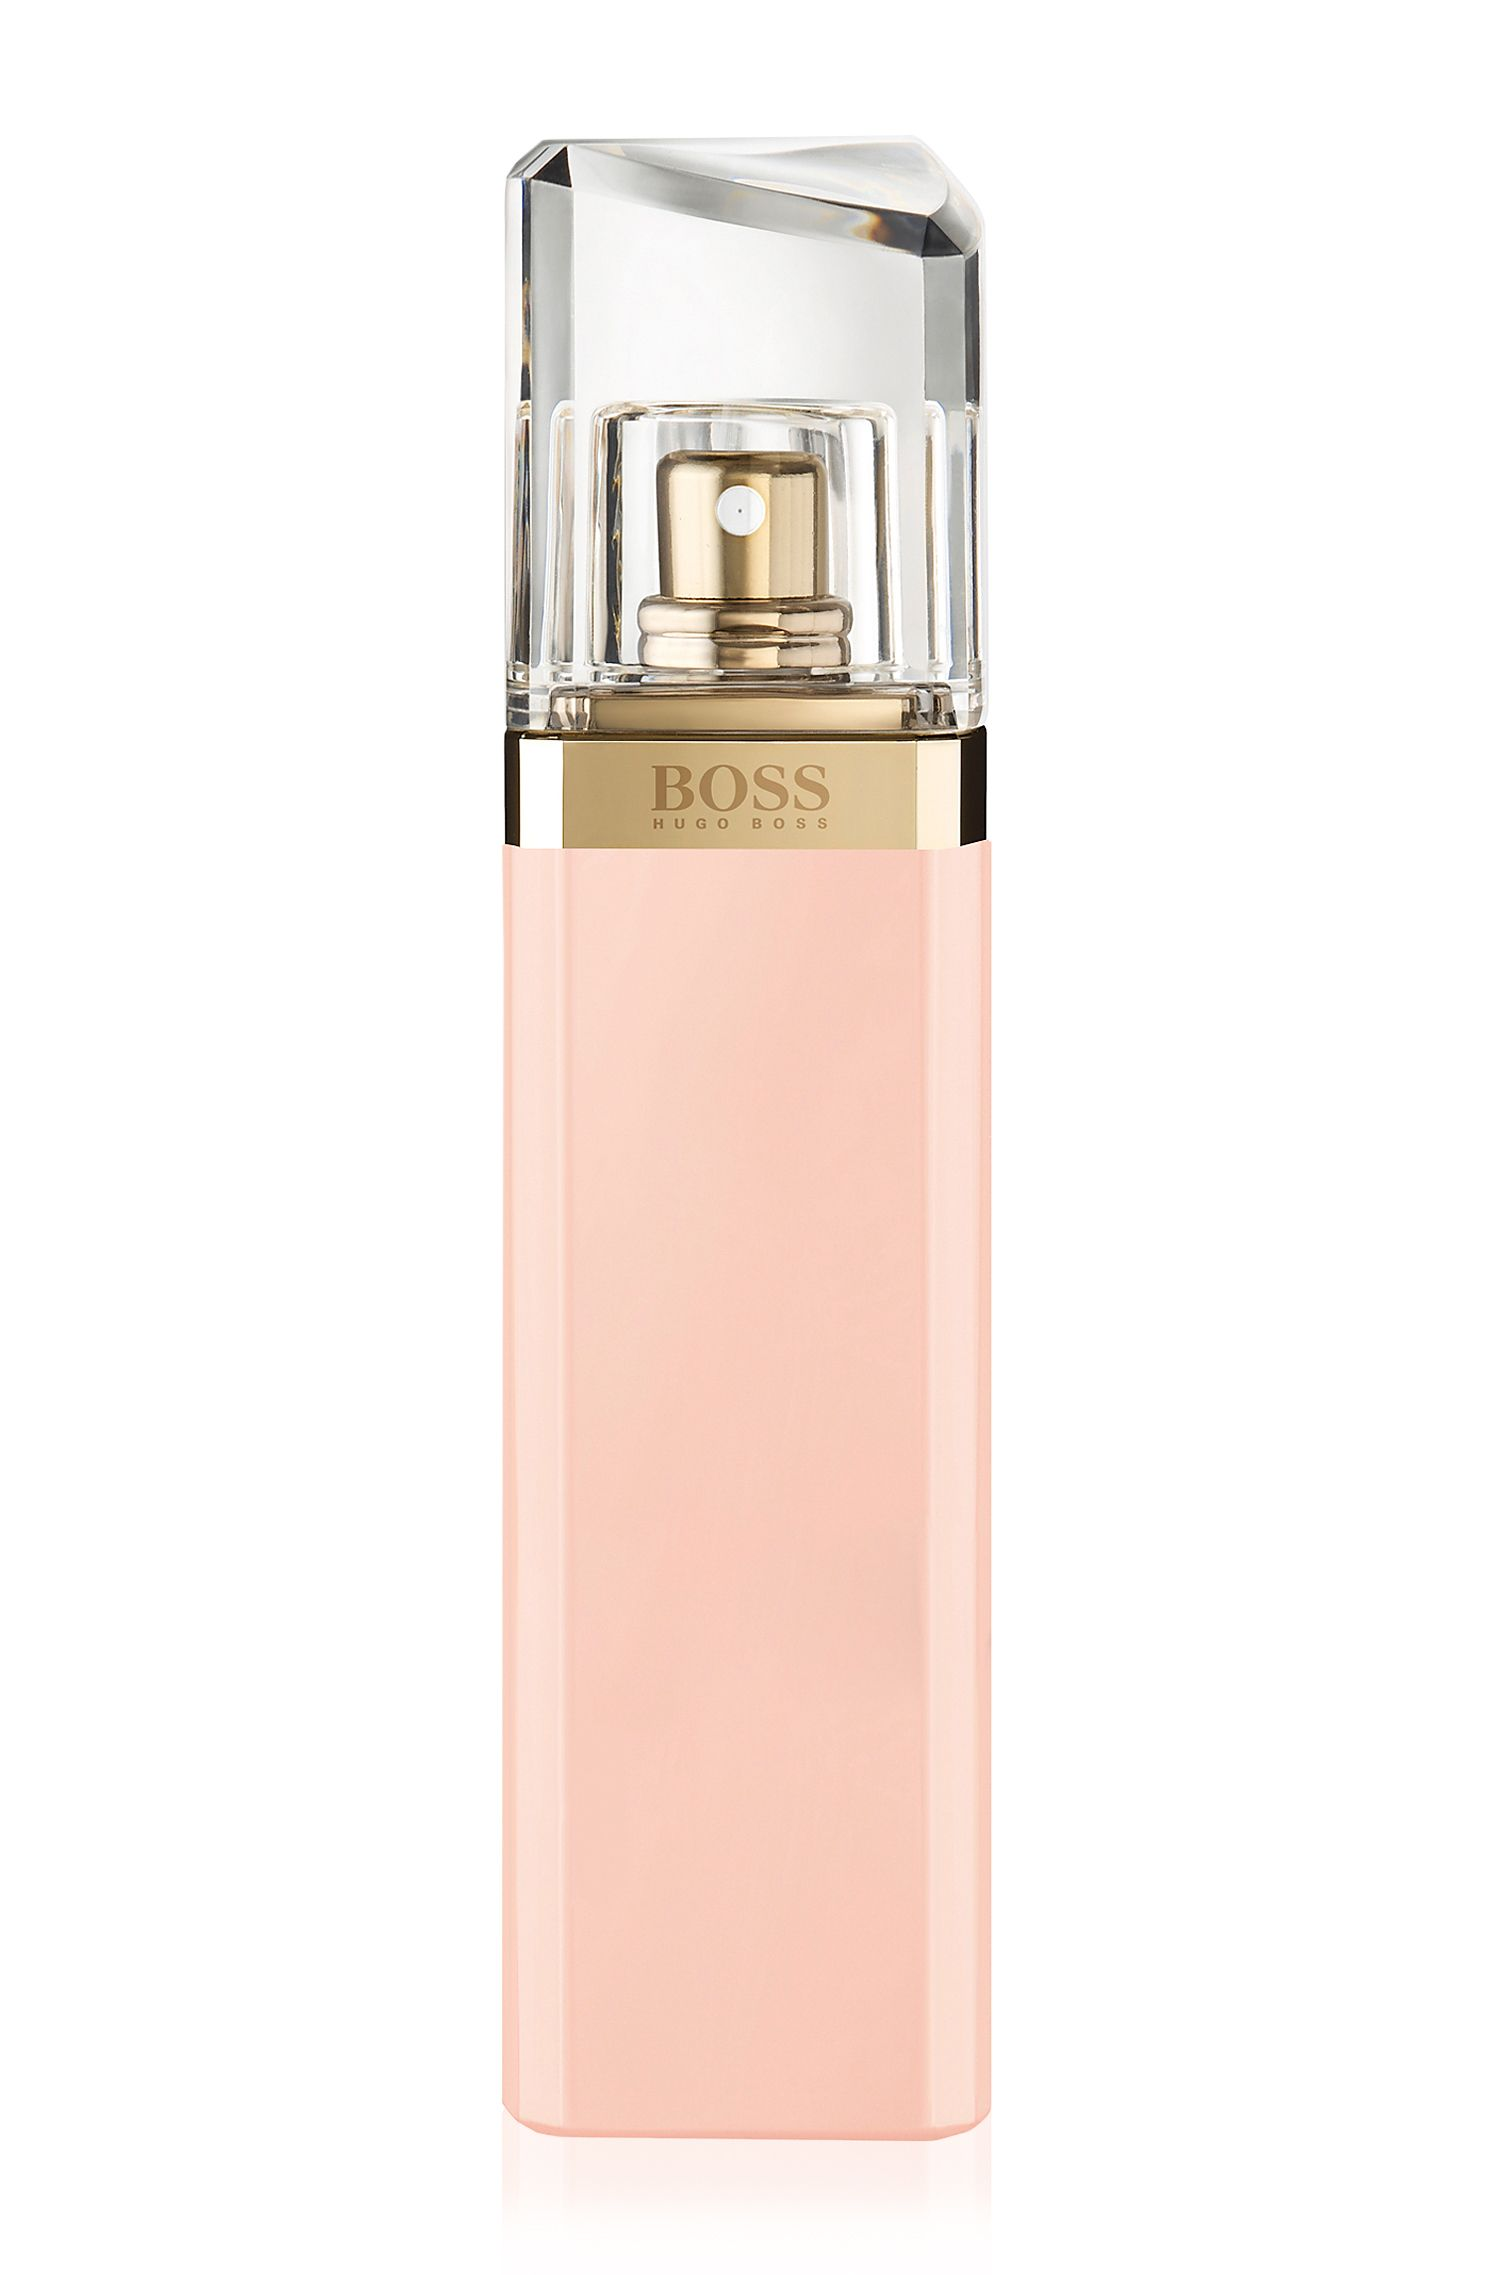 'BOSS Ma Vie' | 1.7 oz (50 mL) Eau de Parfum